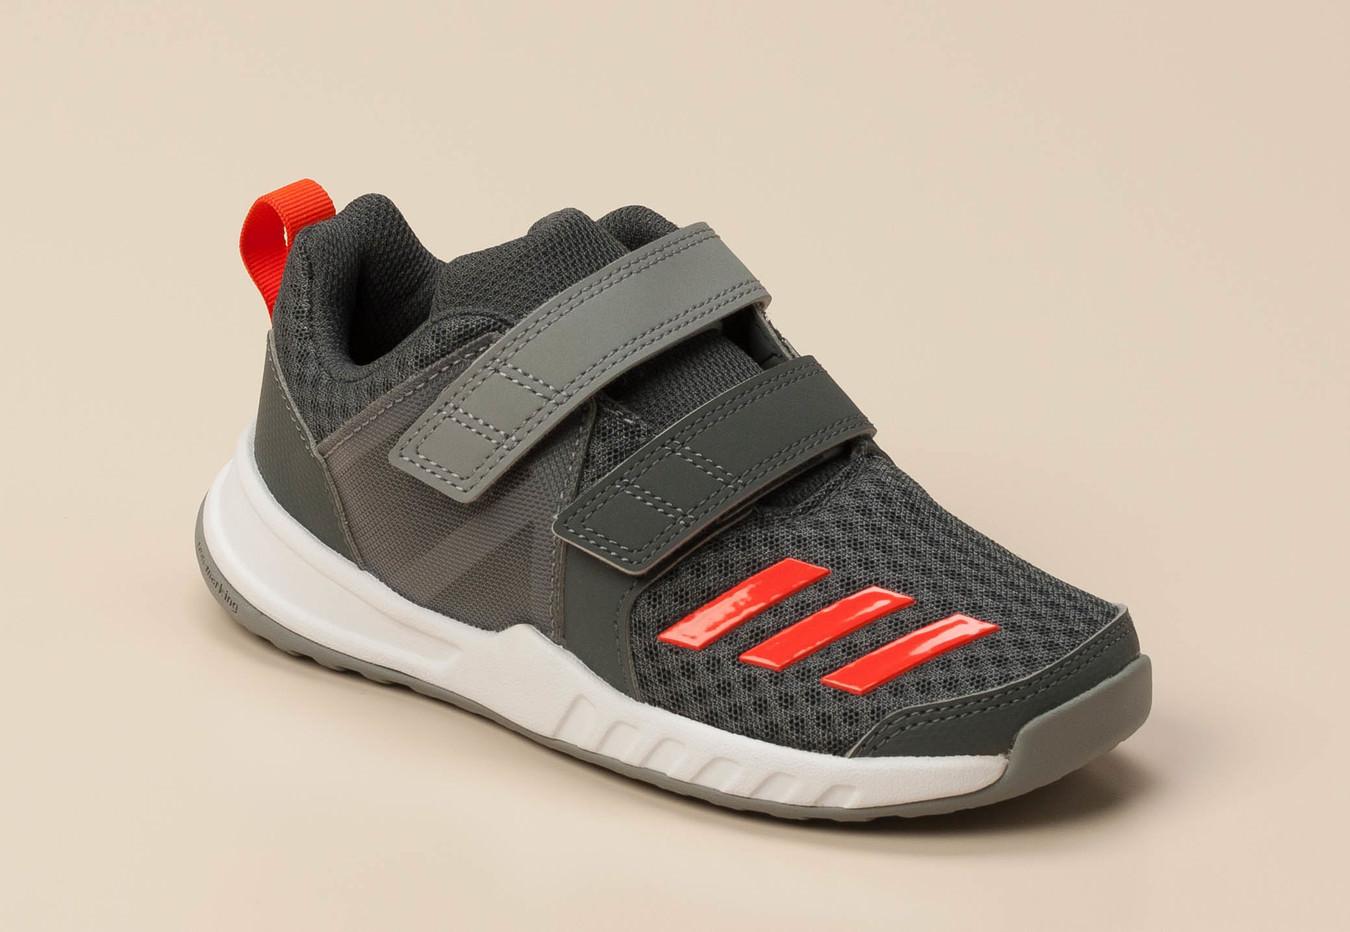 new product cfdc4 dd85d Adidas Kinder Sneaker in grau kaufen | Zumnorde Online-Shop